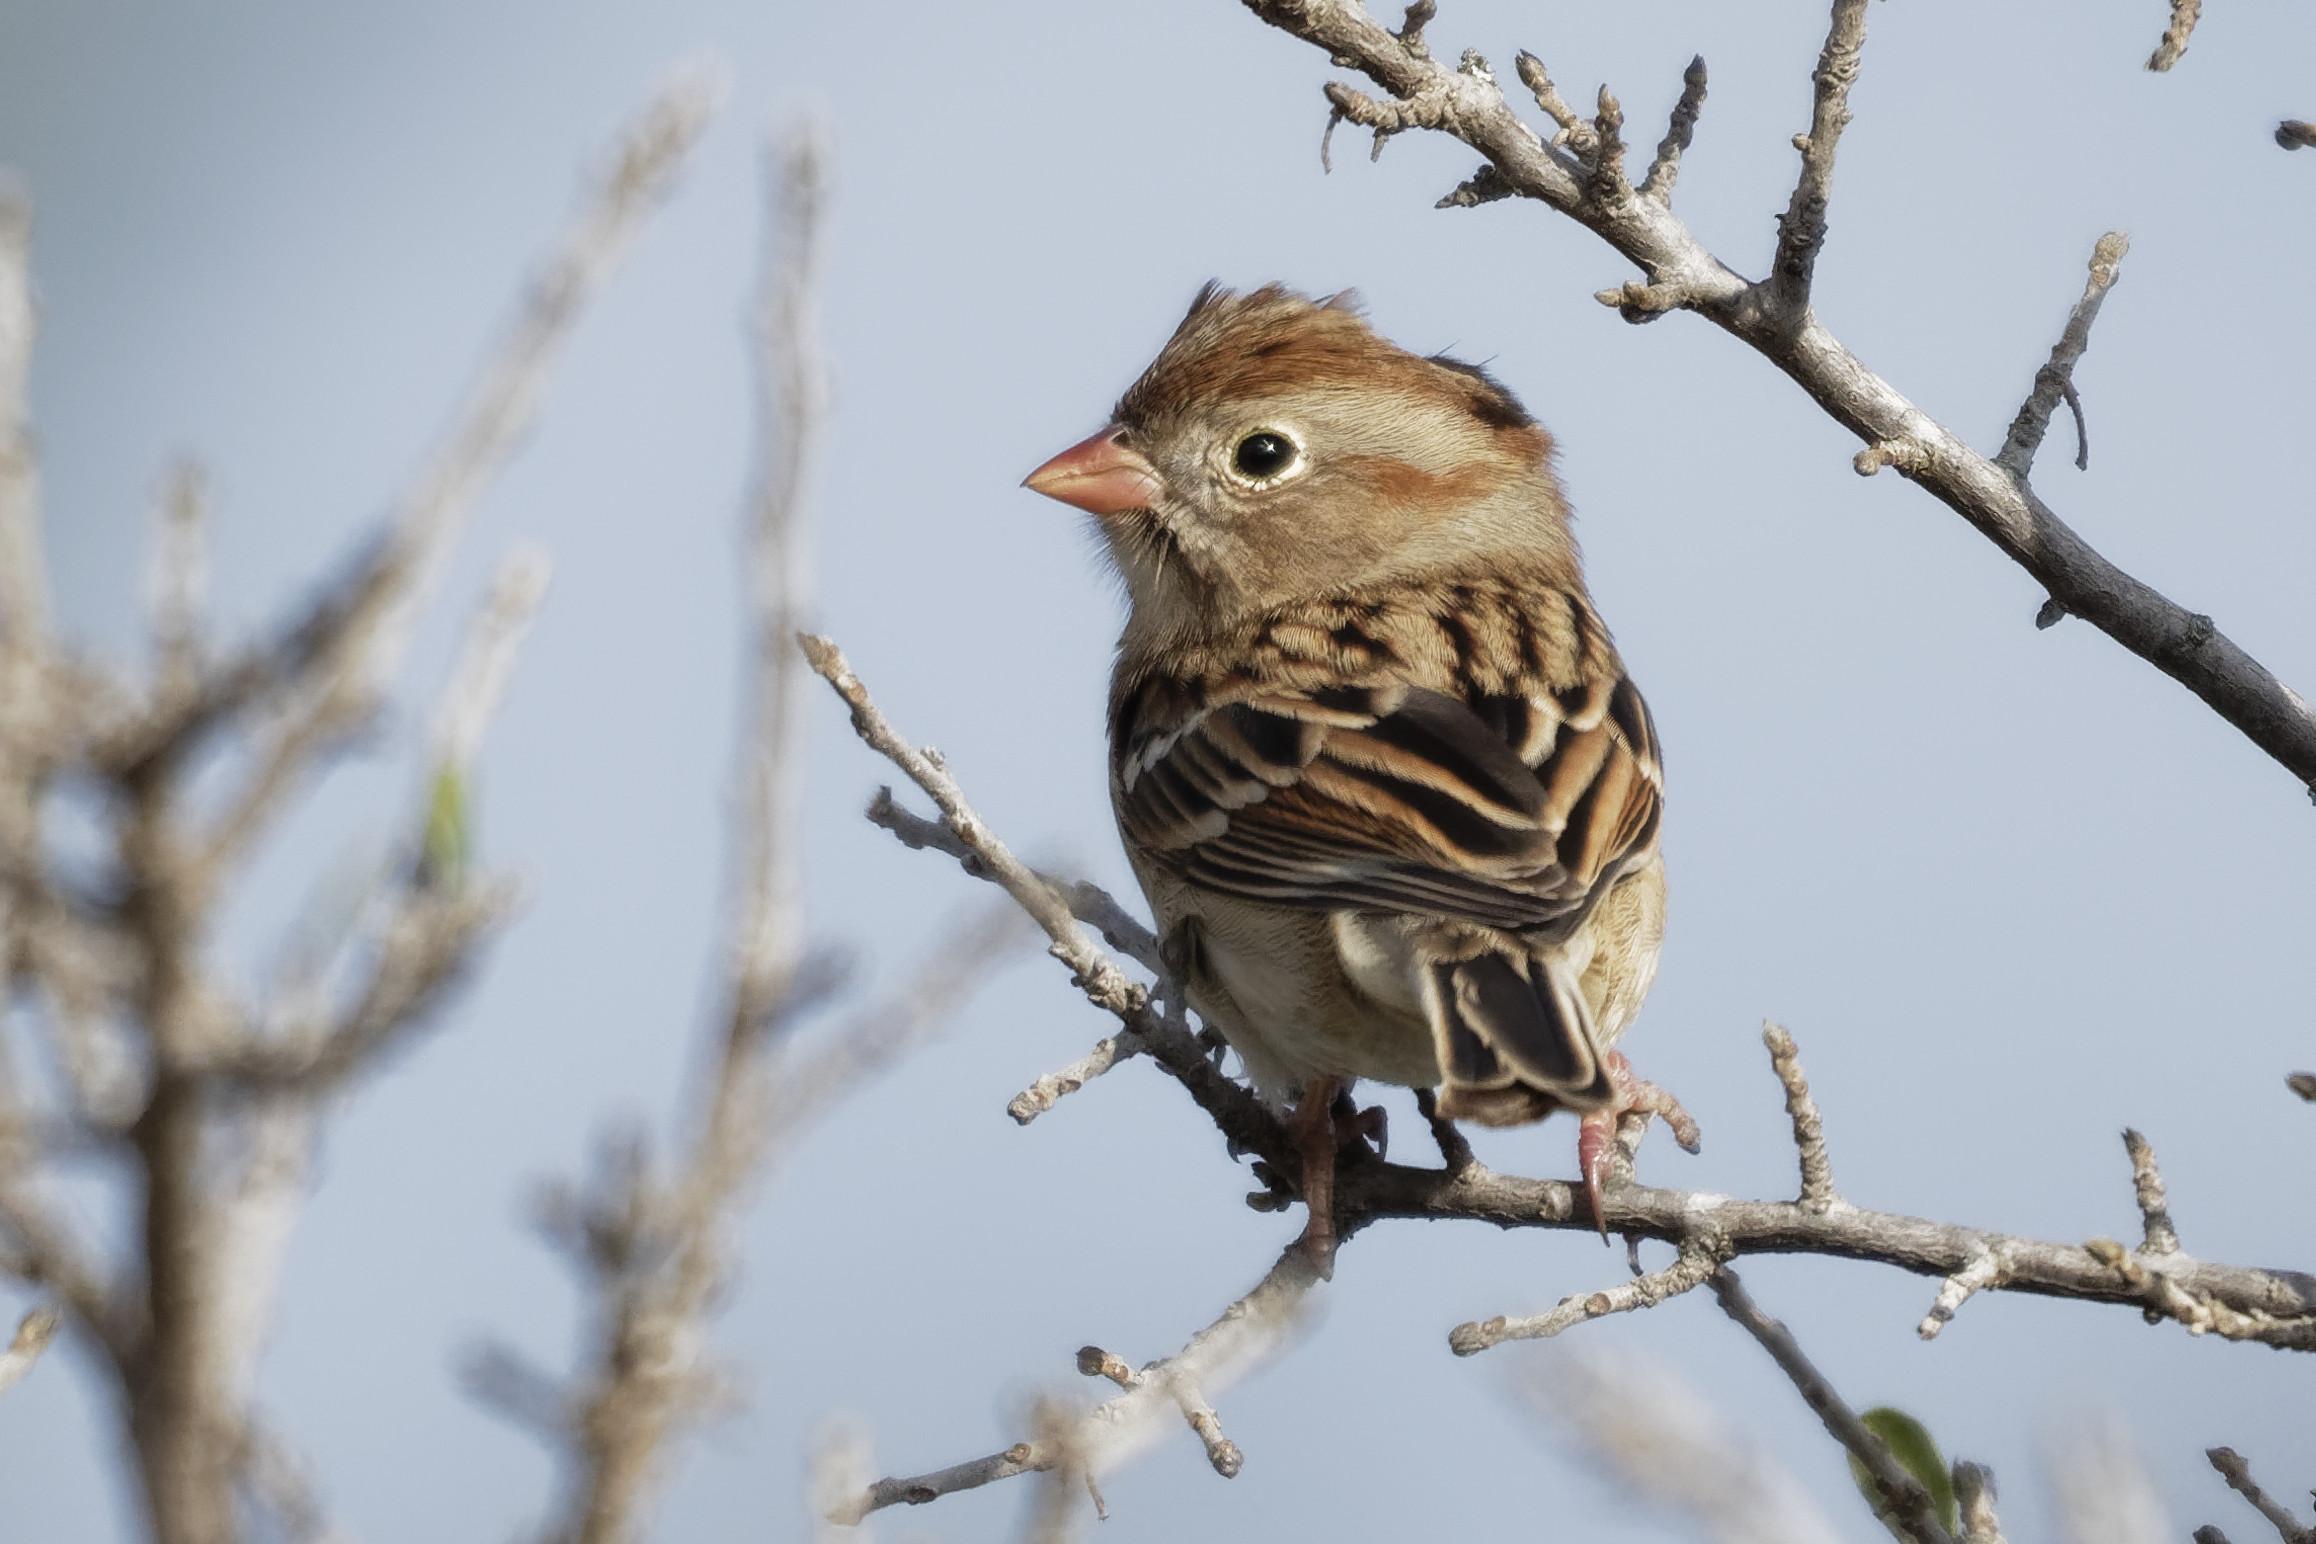 Species: Field Sparrow Photo Credit: Dina Perry Date: December 2018 Location: Stone Oak Park